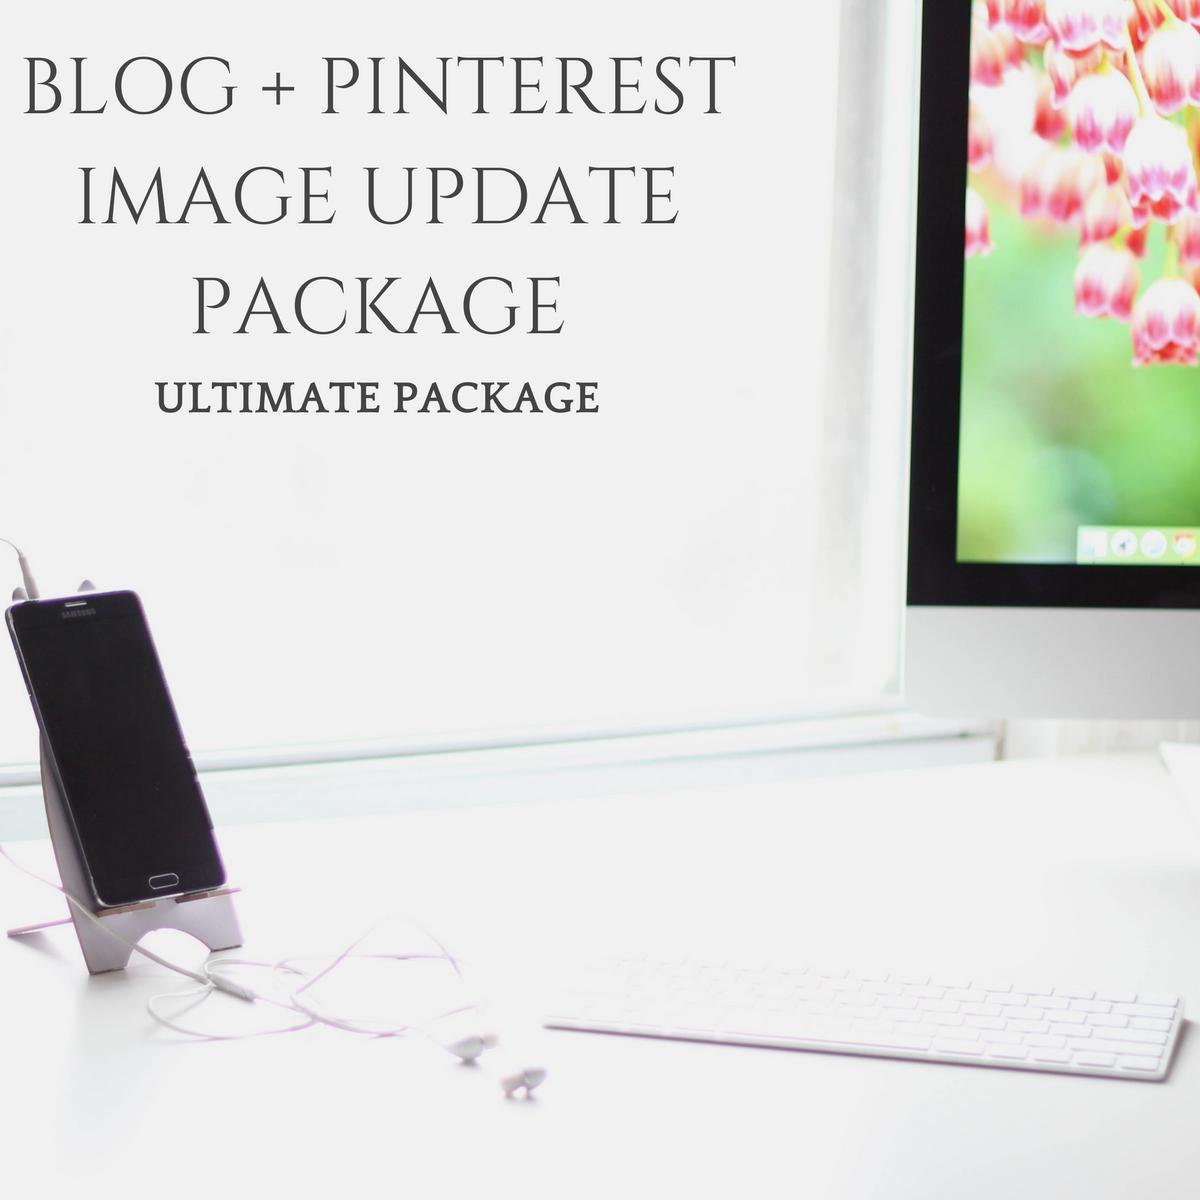 BLOG + PINTEREST IMAGE UPDATES - ULTIMATE PACKAGE